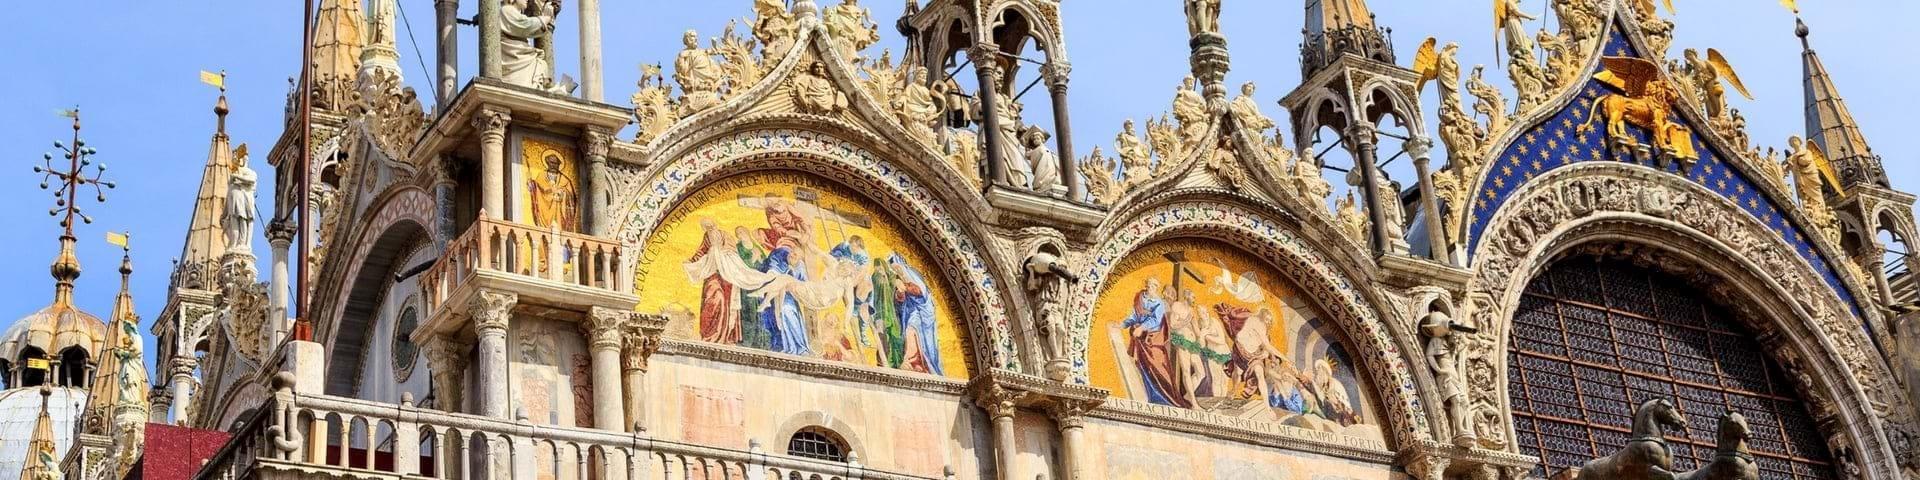 St. Mark's Basilica Tours